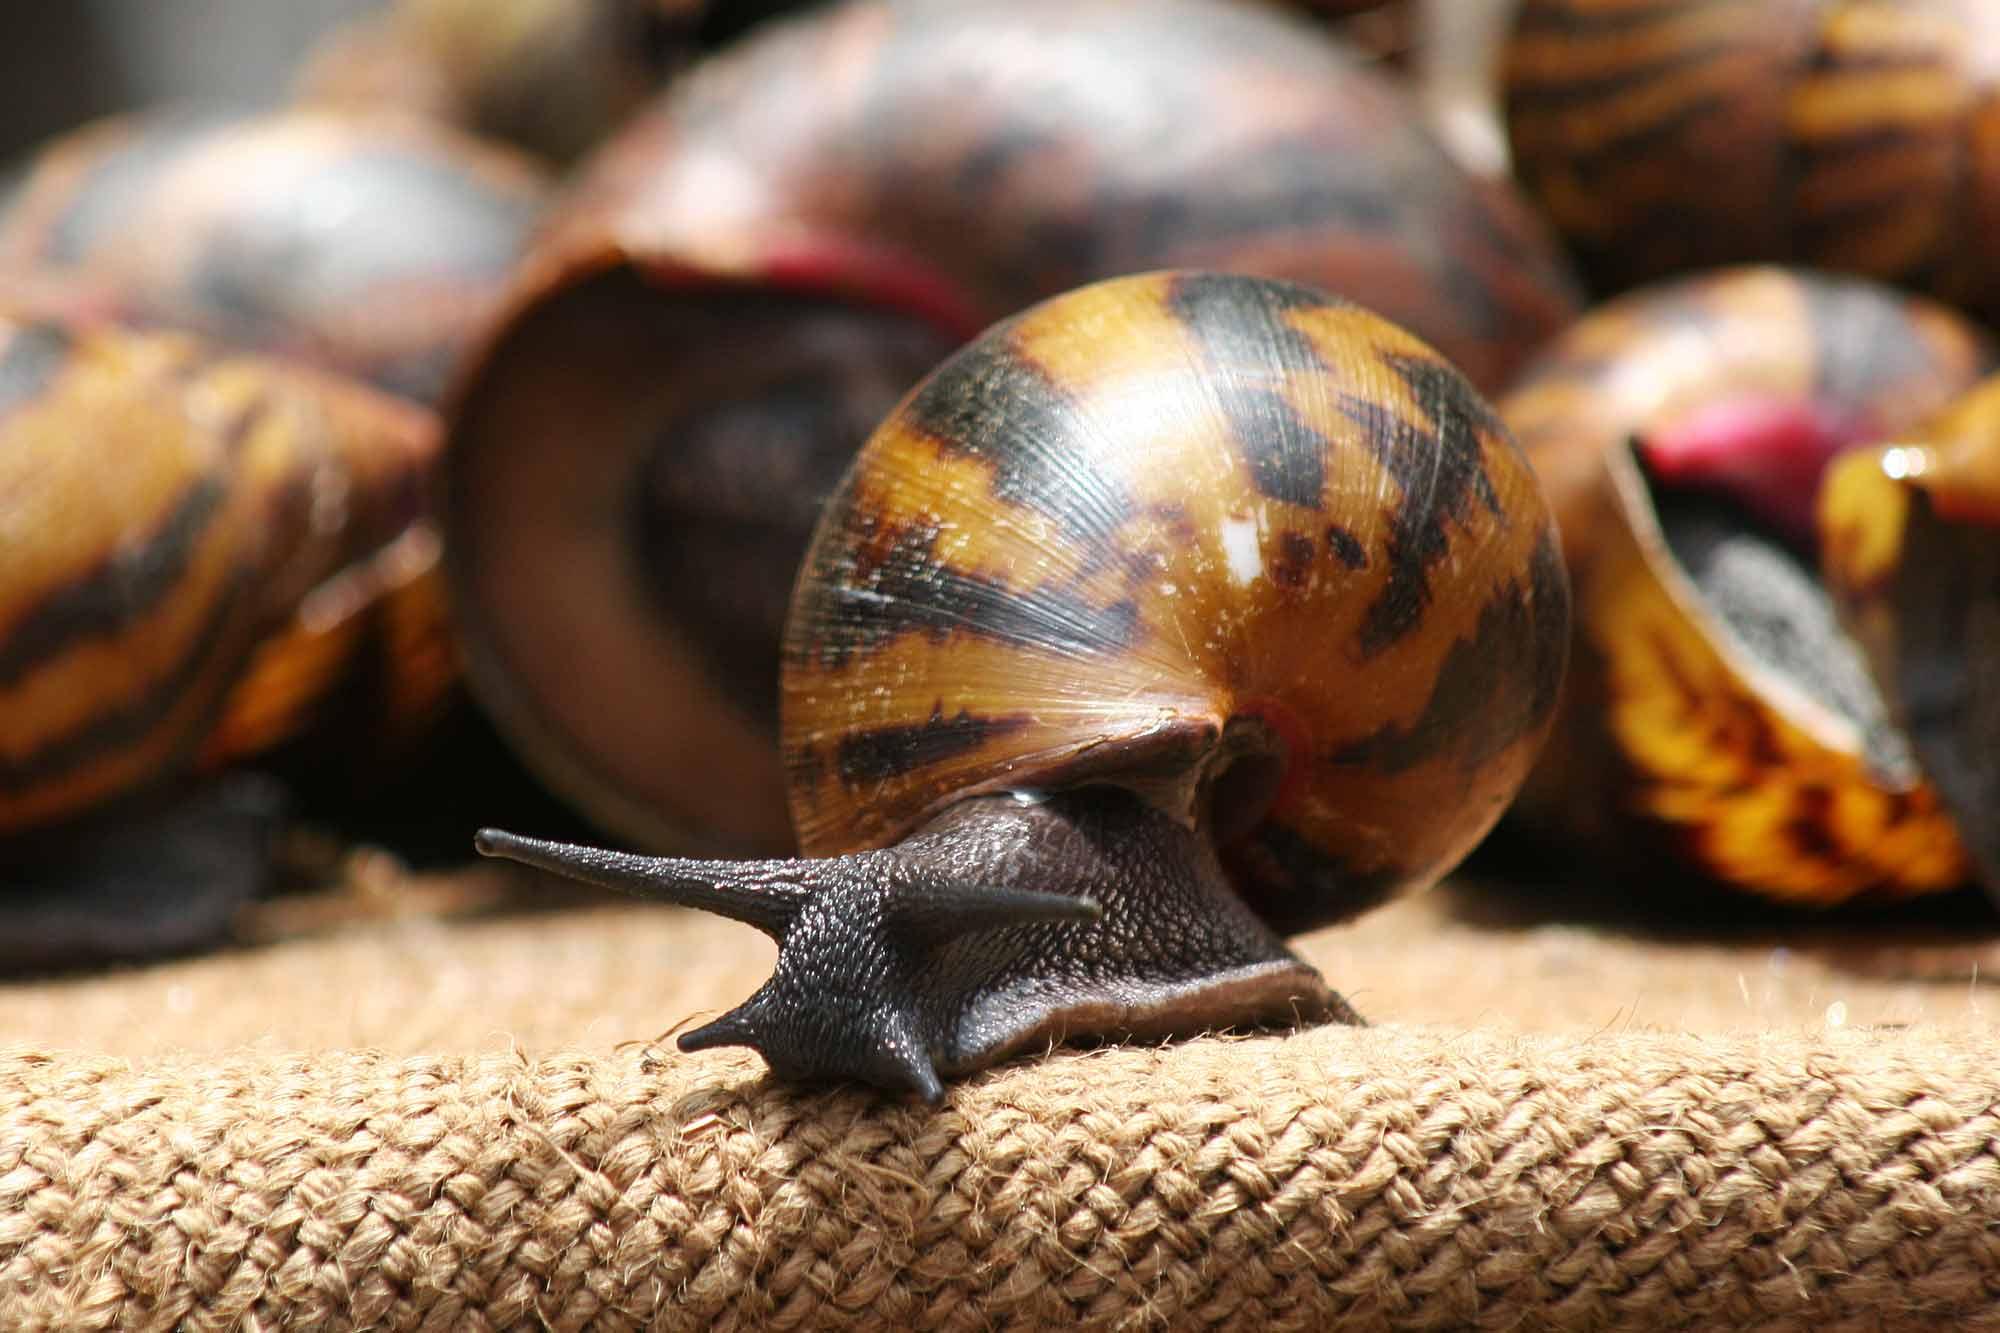 snails-market-accra-ghana-africa